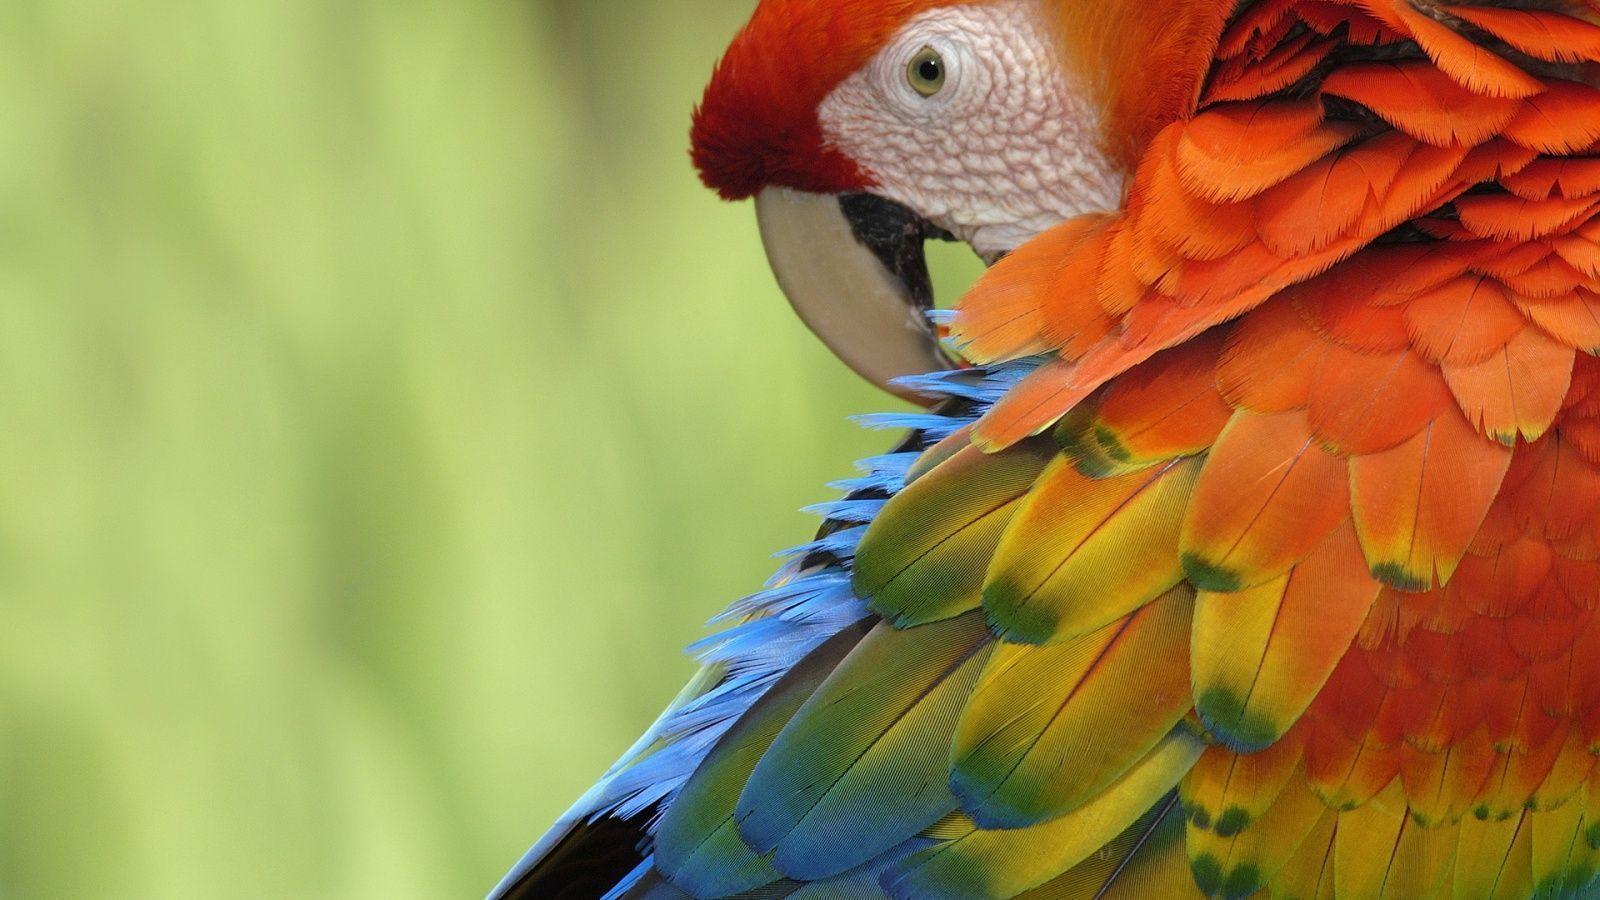 parrot wallpapers wallpaper cave